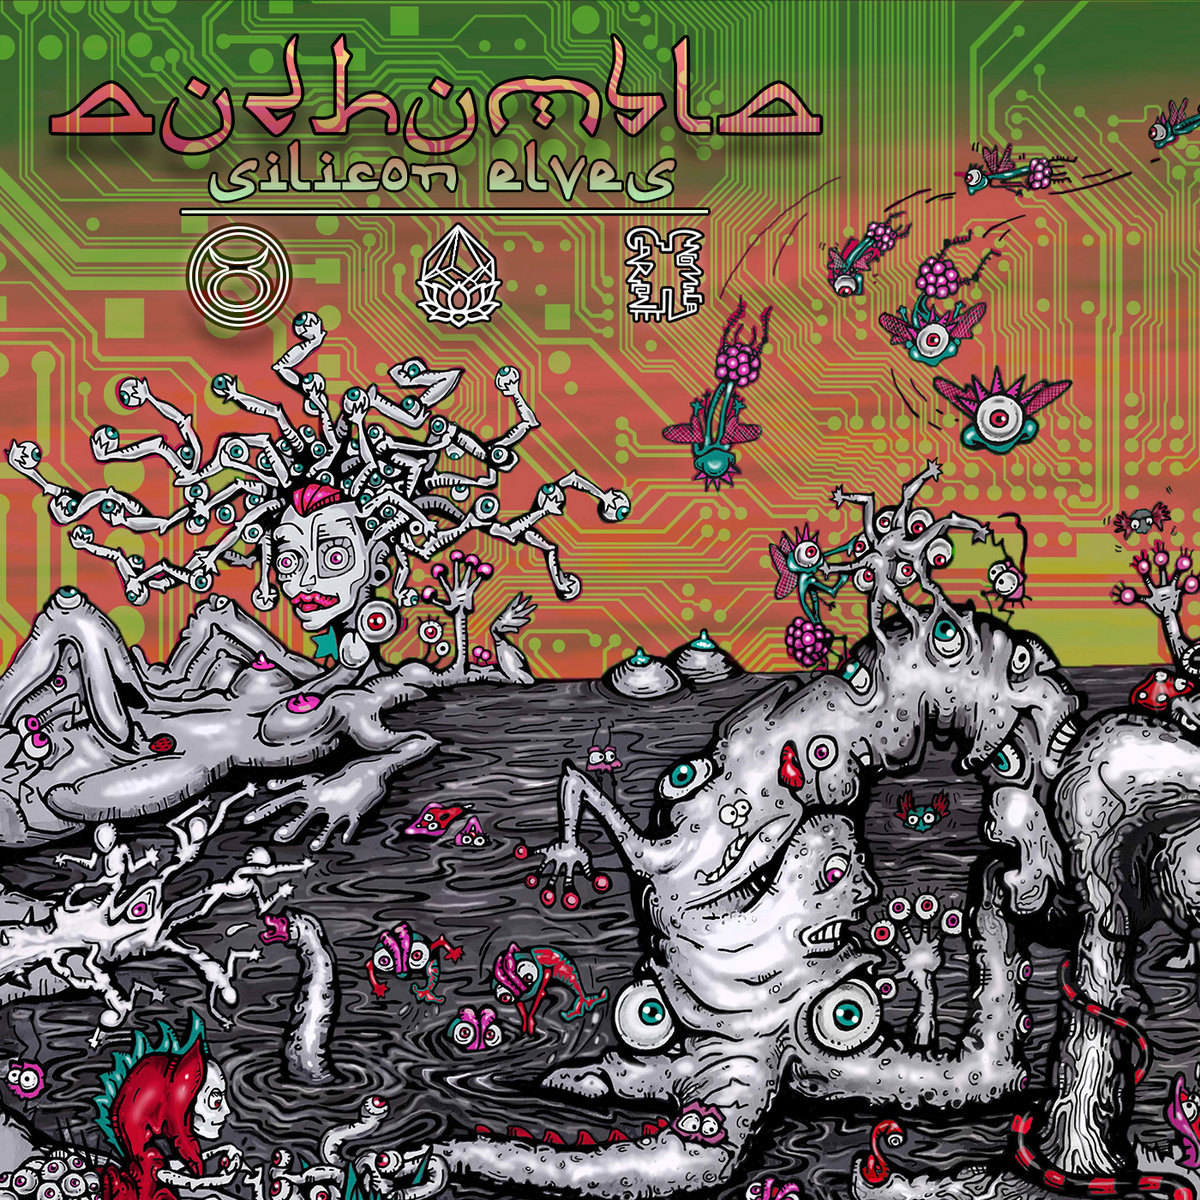 EP Audhumbla -